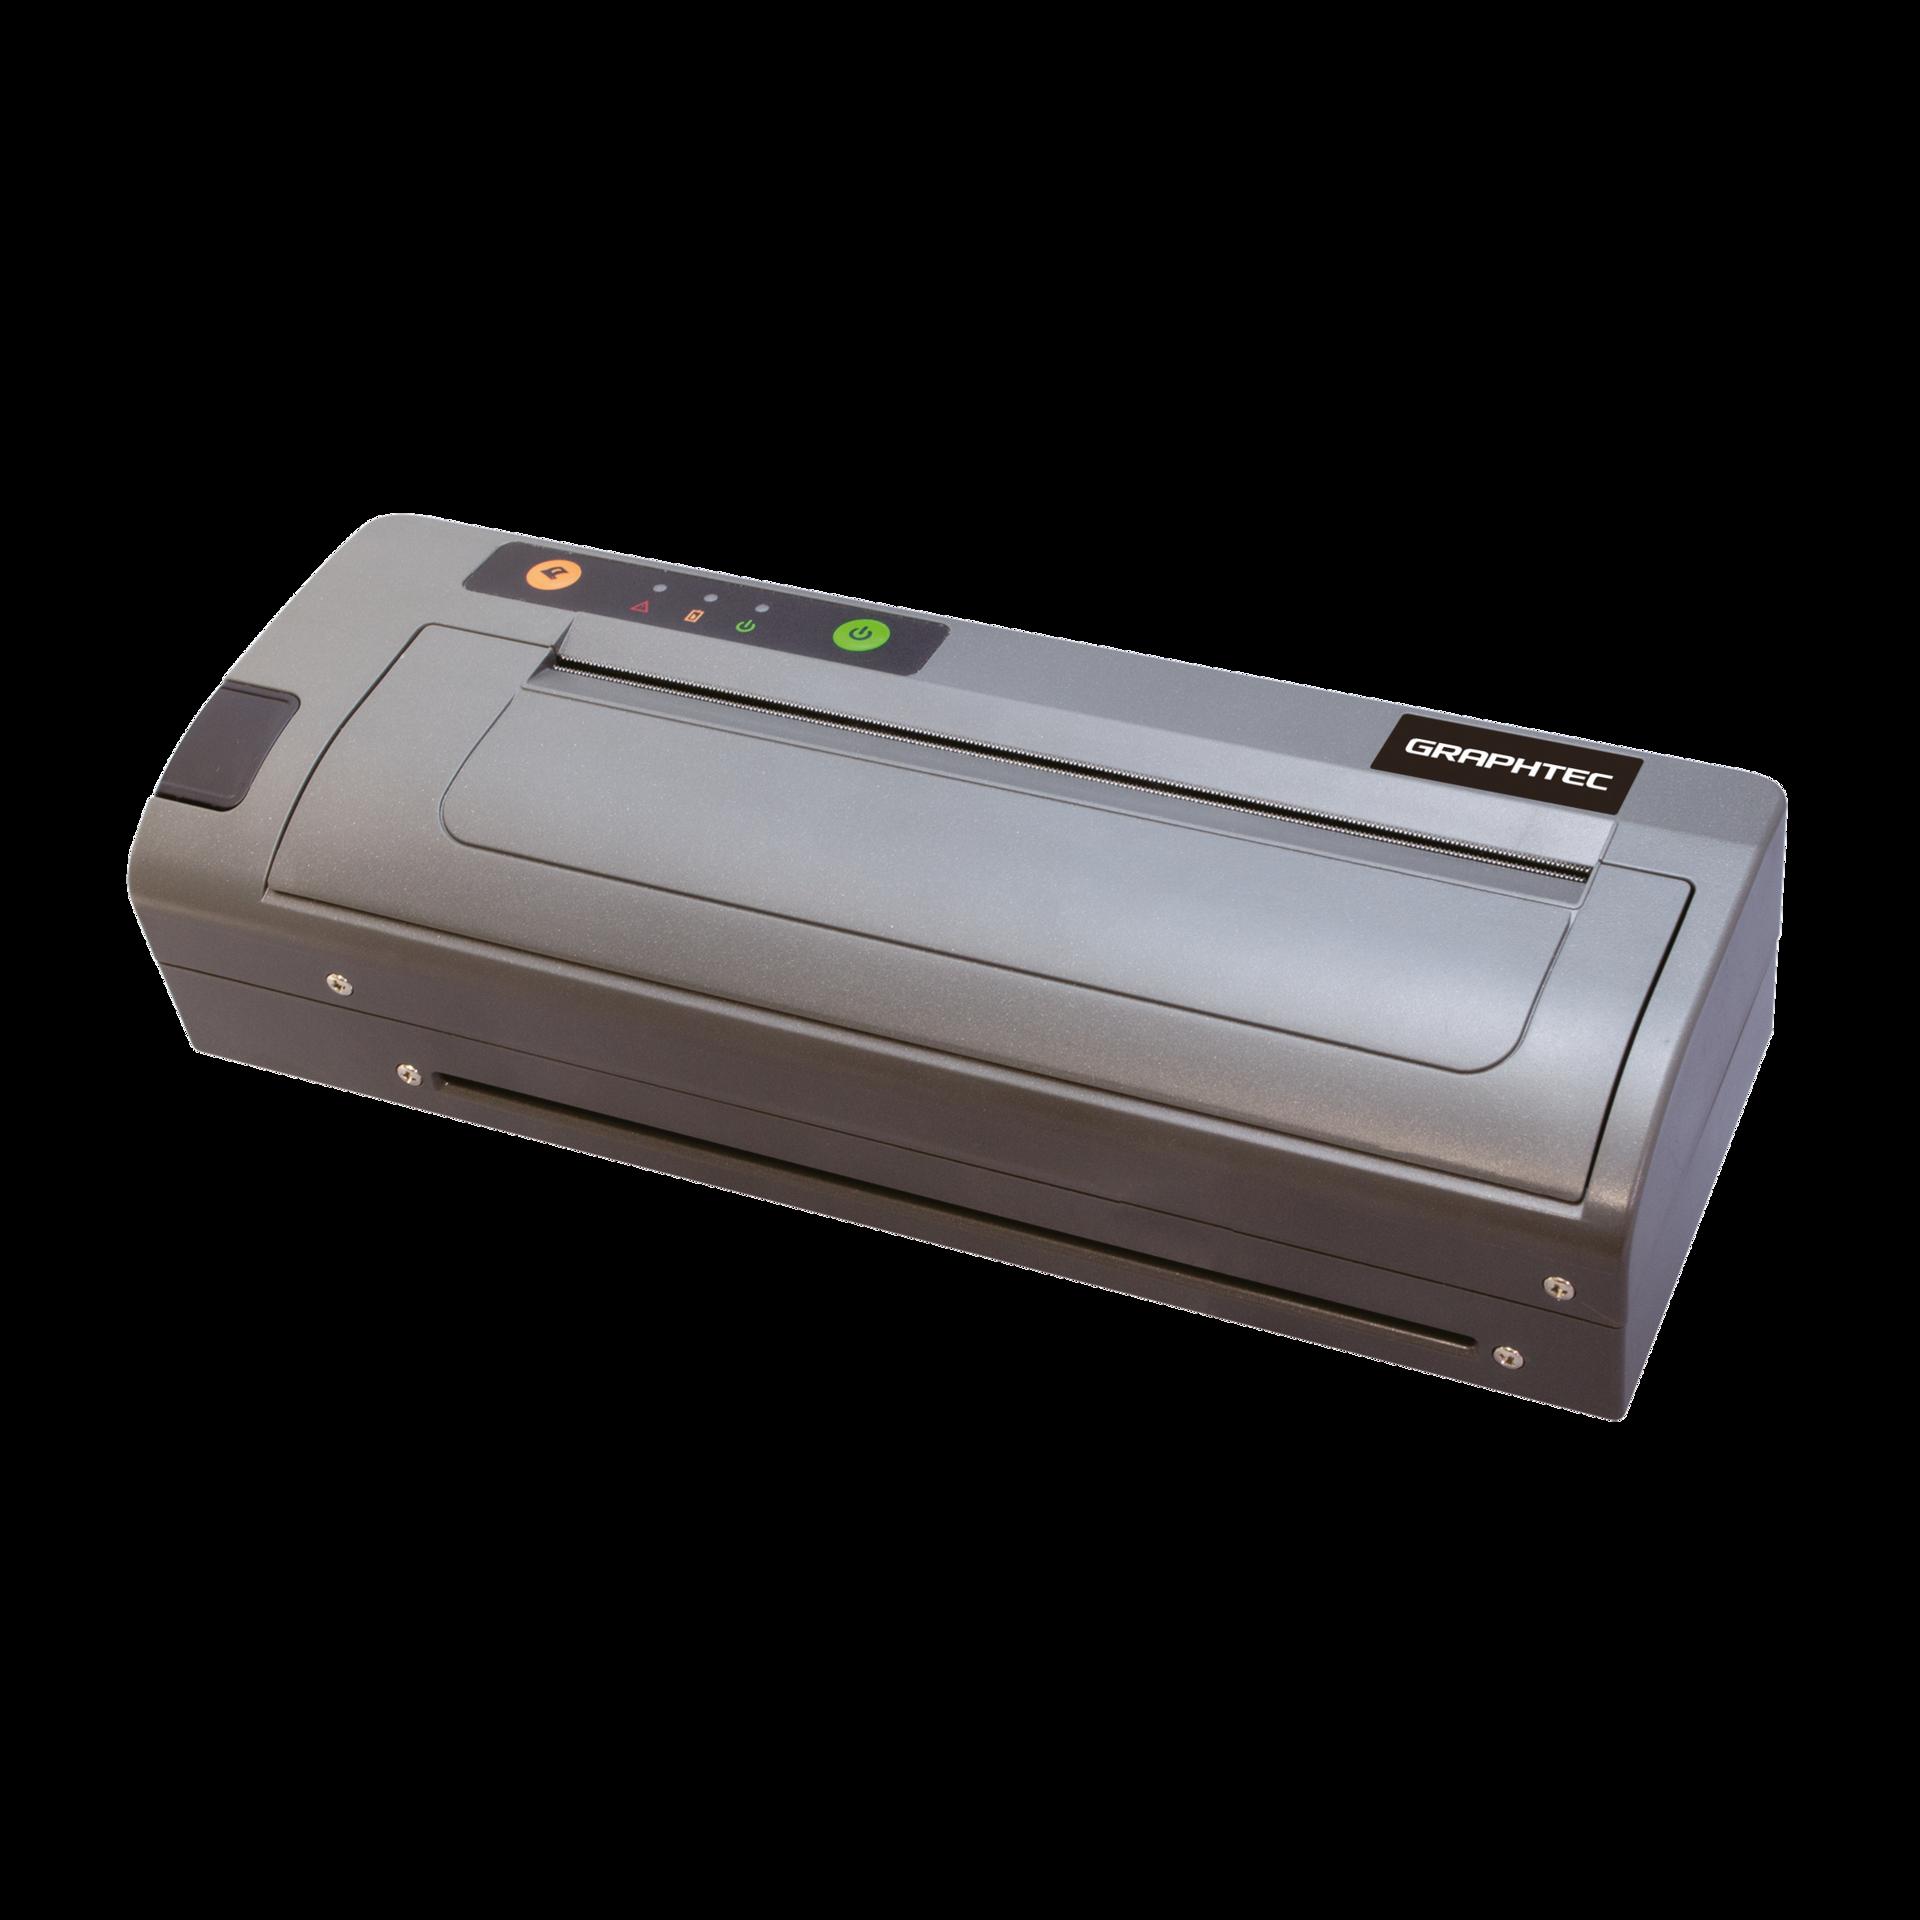 GRAPHTEC 용지출력 써멀프린터 / 페이퍼레코더 DP-581H